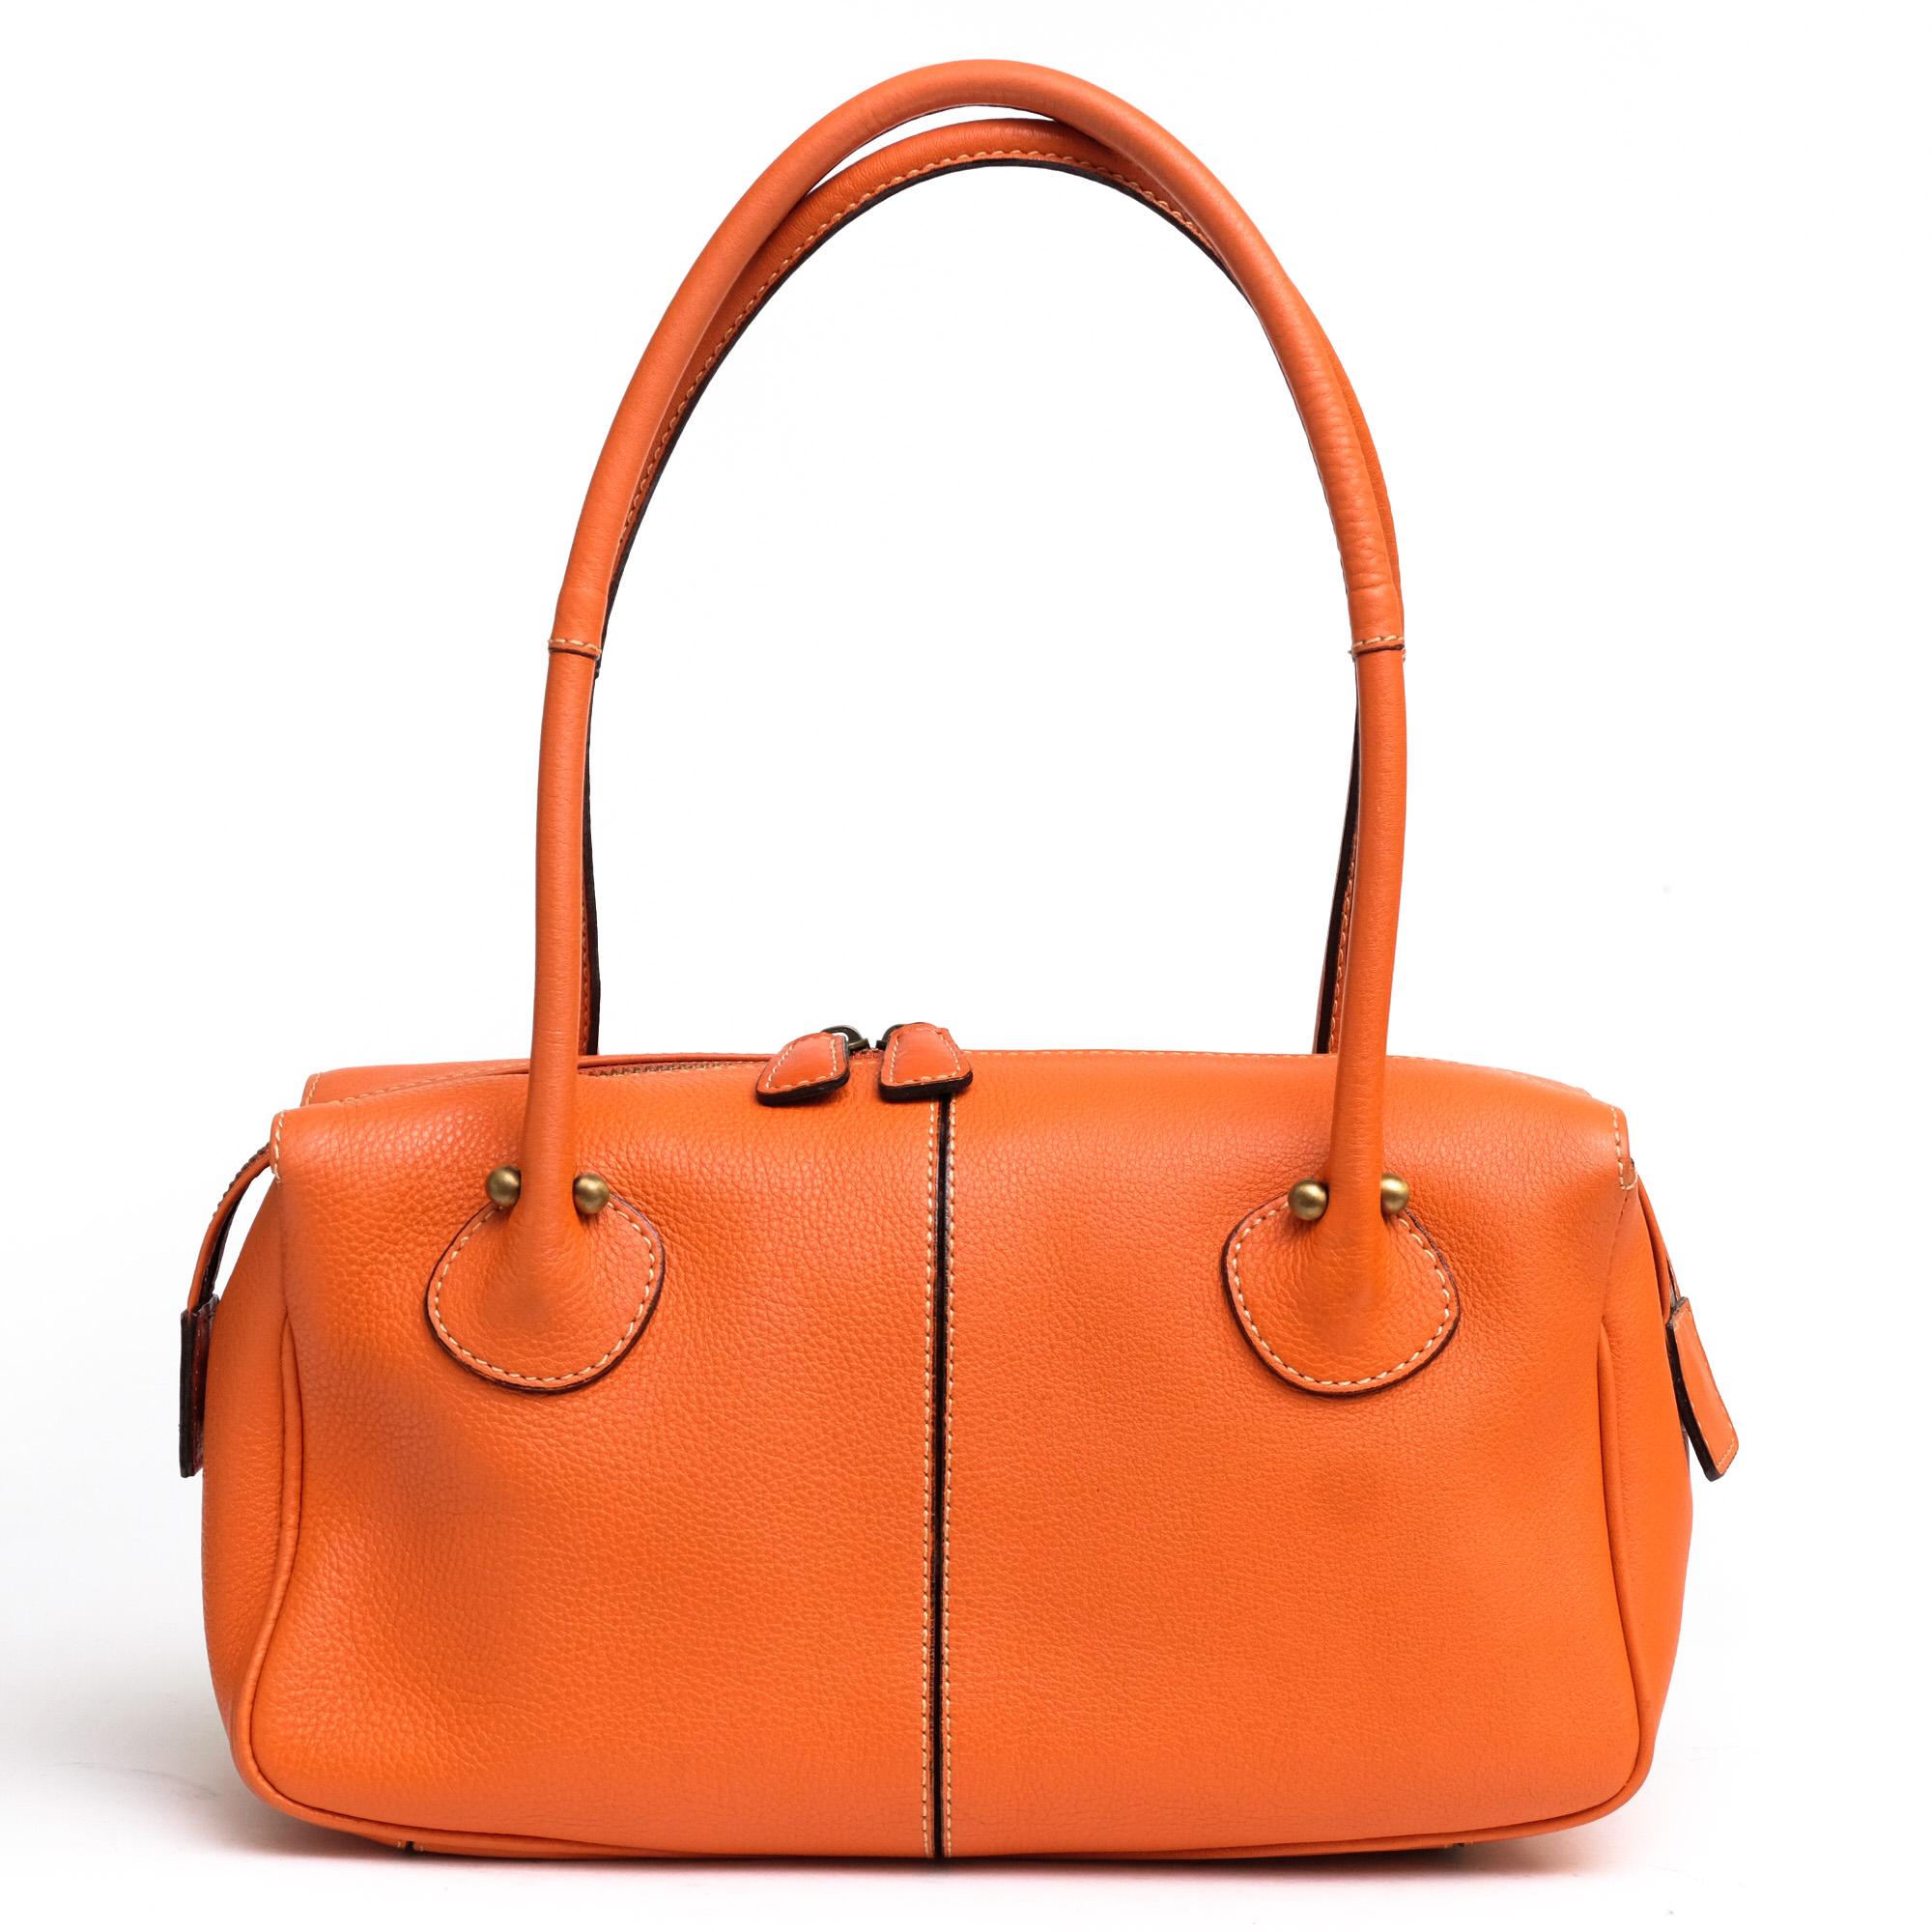 121319946f4e 土屋鞄 / TSUCHIYA-KABAN ハンドバッグ レディース オレンジ シボ革 シュリンクレザー ショルダーバッグ 肩掛け ワンショルダー -  ブランディング